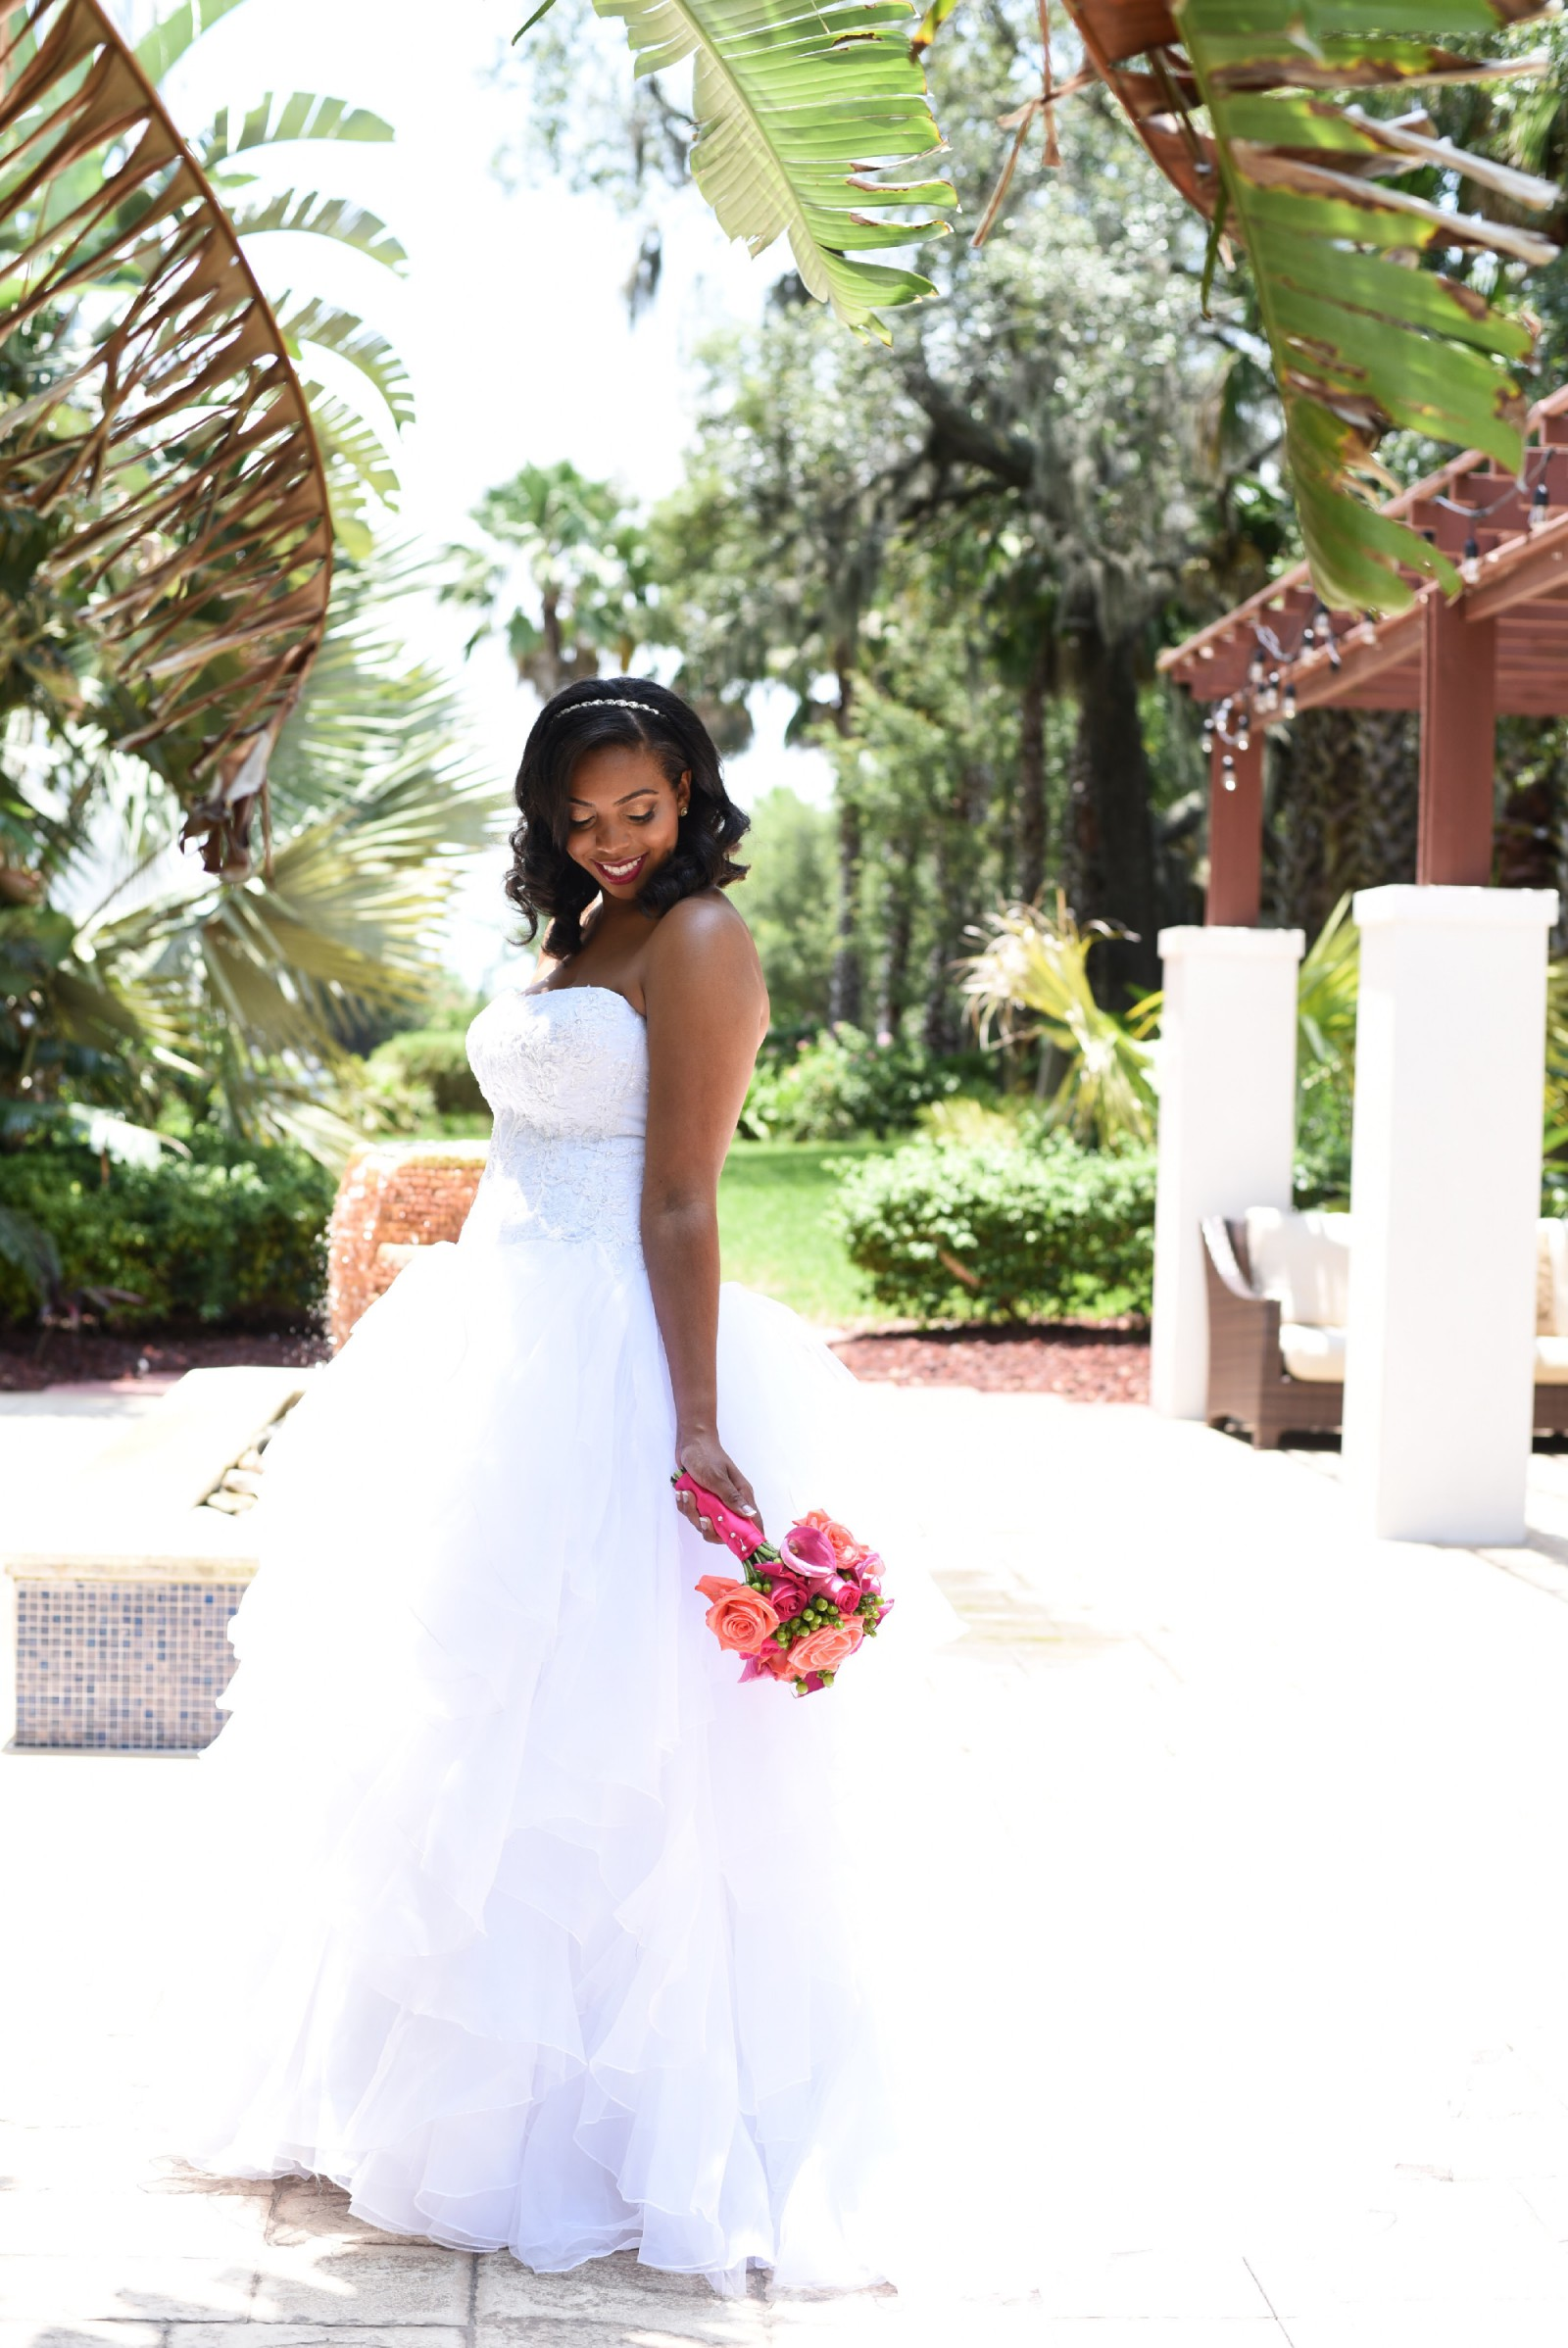 cf23d824e40b Oleg Cassini CWG568 Second Hand Wedding Dress on Sale 76% Off - Stillwhite  South Africa